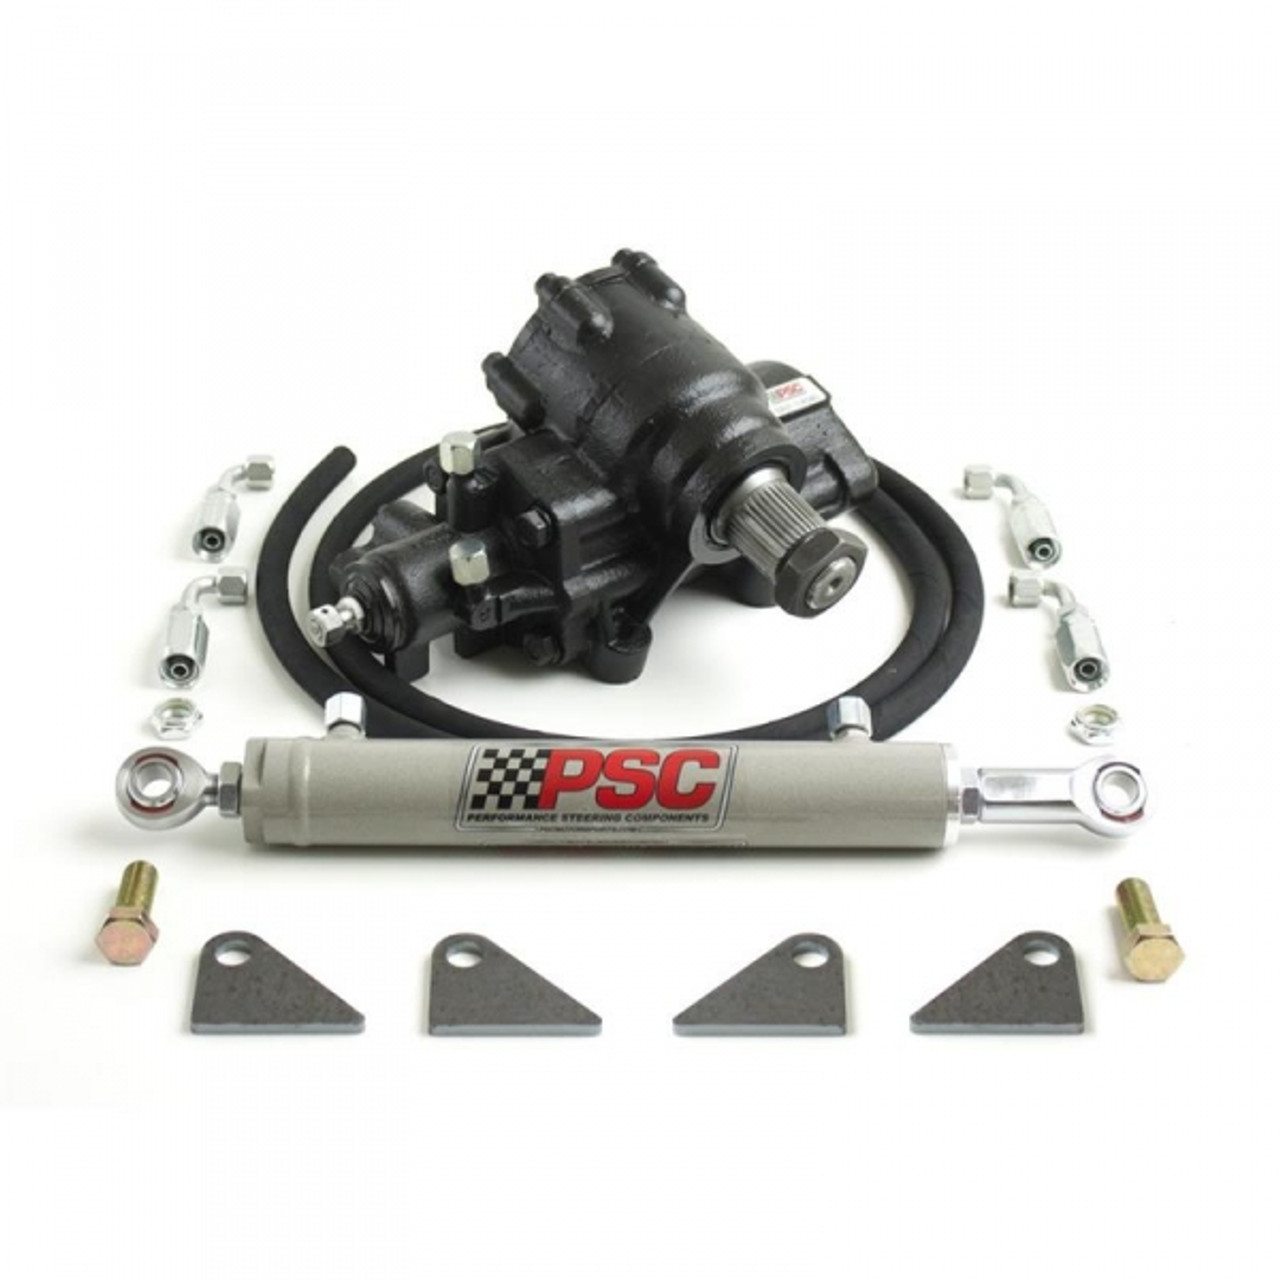 PSC Hydraulic Assist Steering Kit